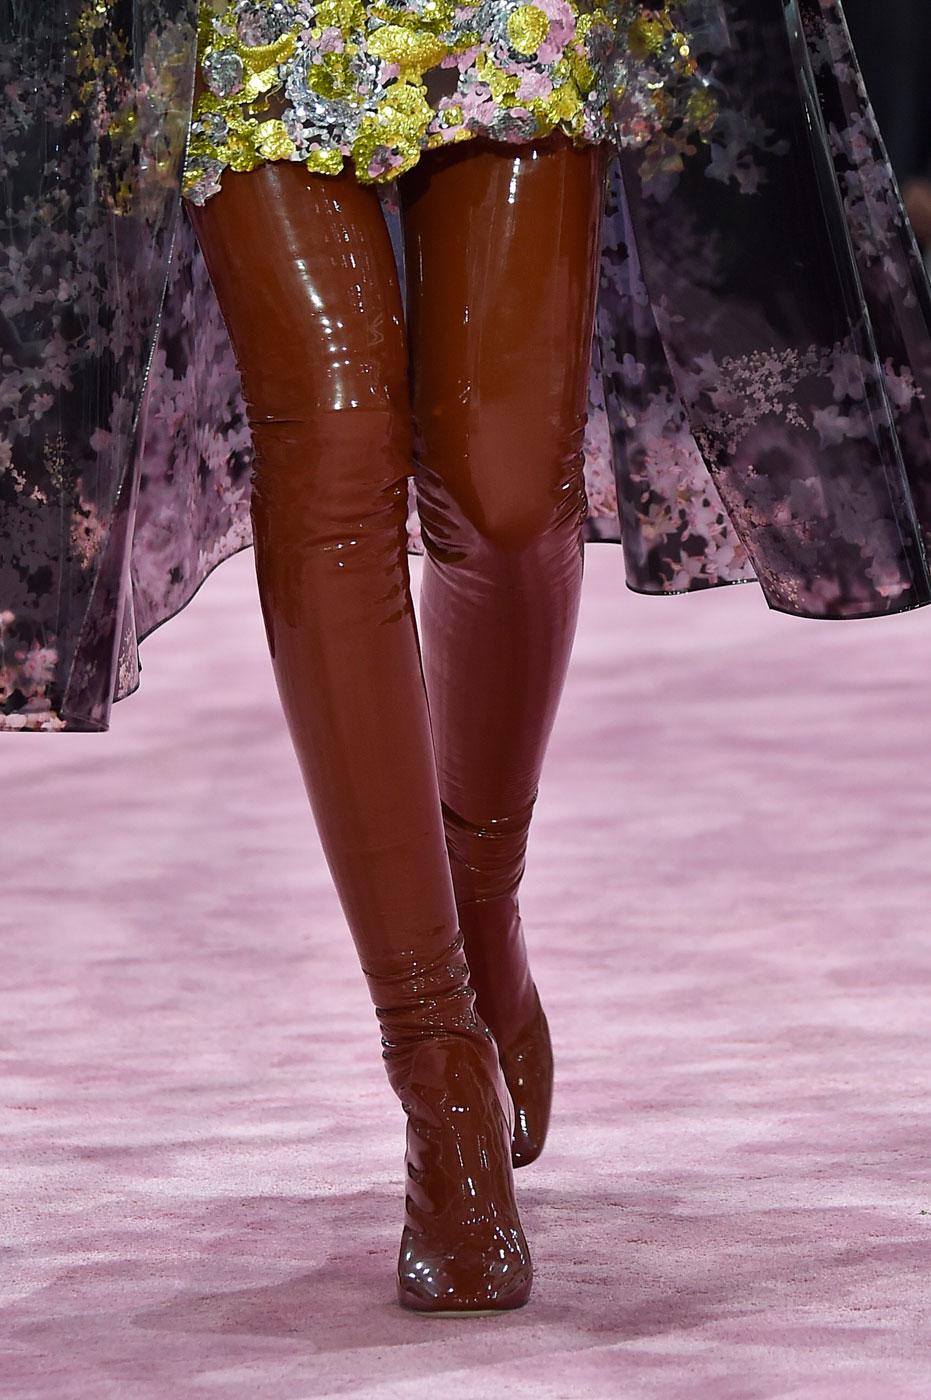 Christian-Dior-fashion-runway-show-close-ups-haute-couture-paris-spring-summer-2015-the-impression-006